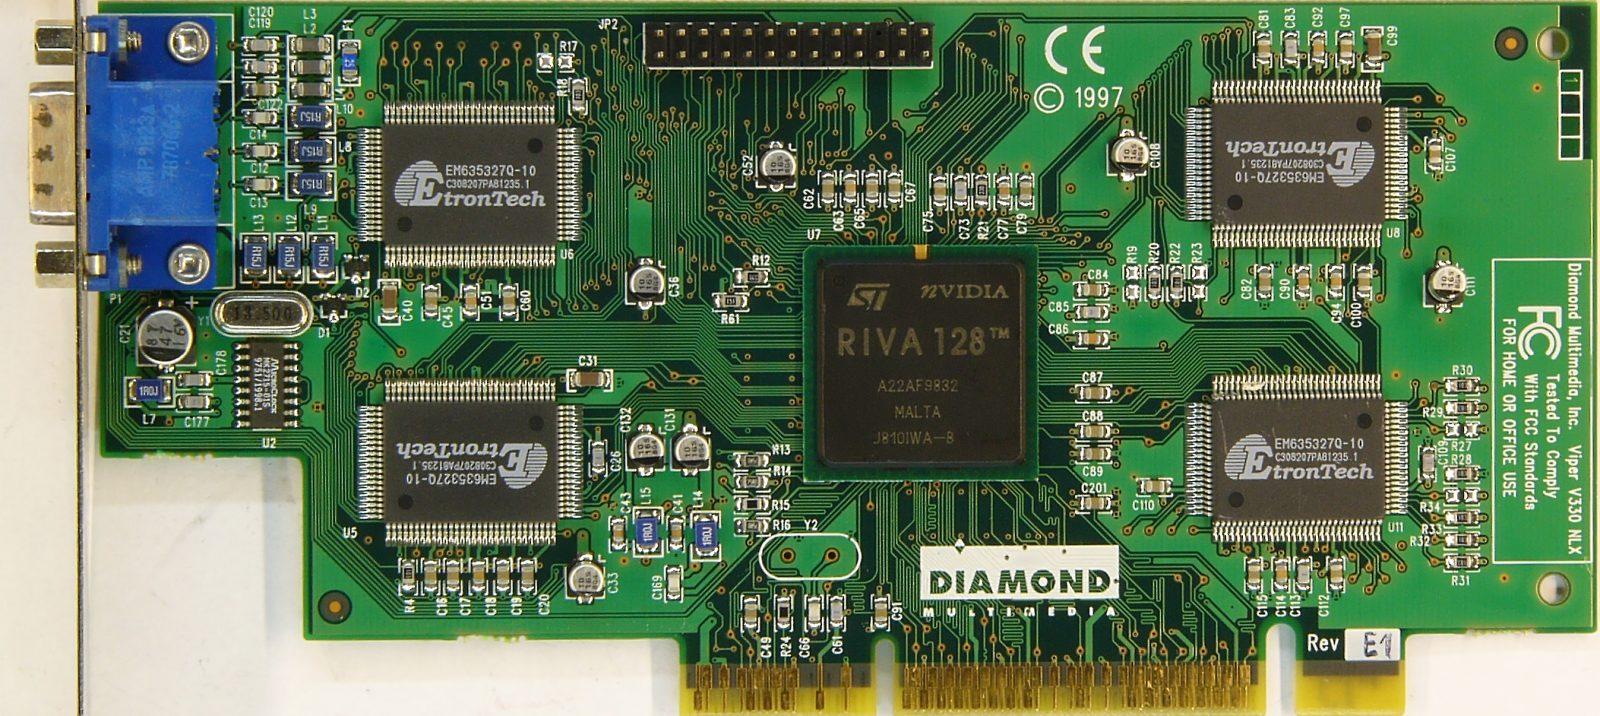 Diamond Viper V graphics card - Riva TNT - 8 MB Specs